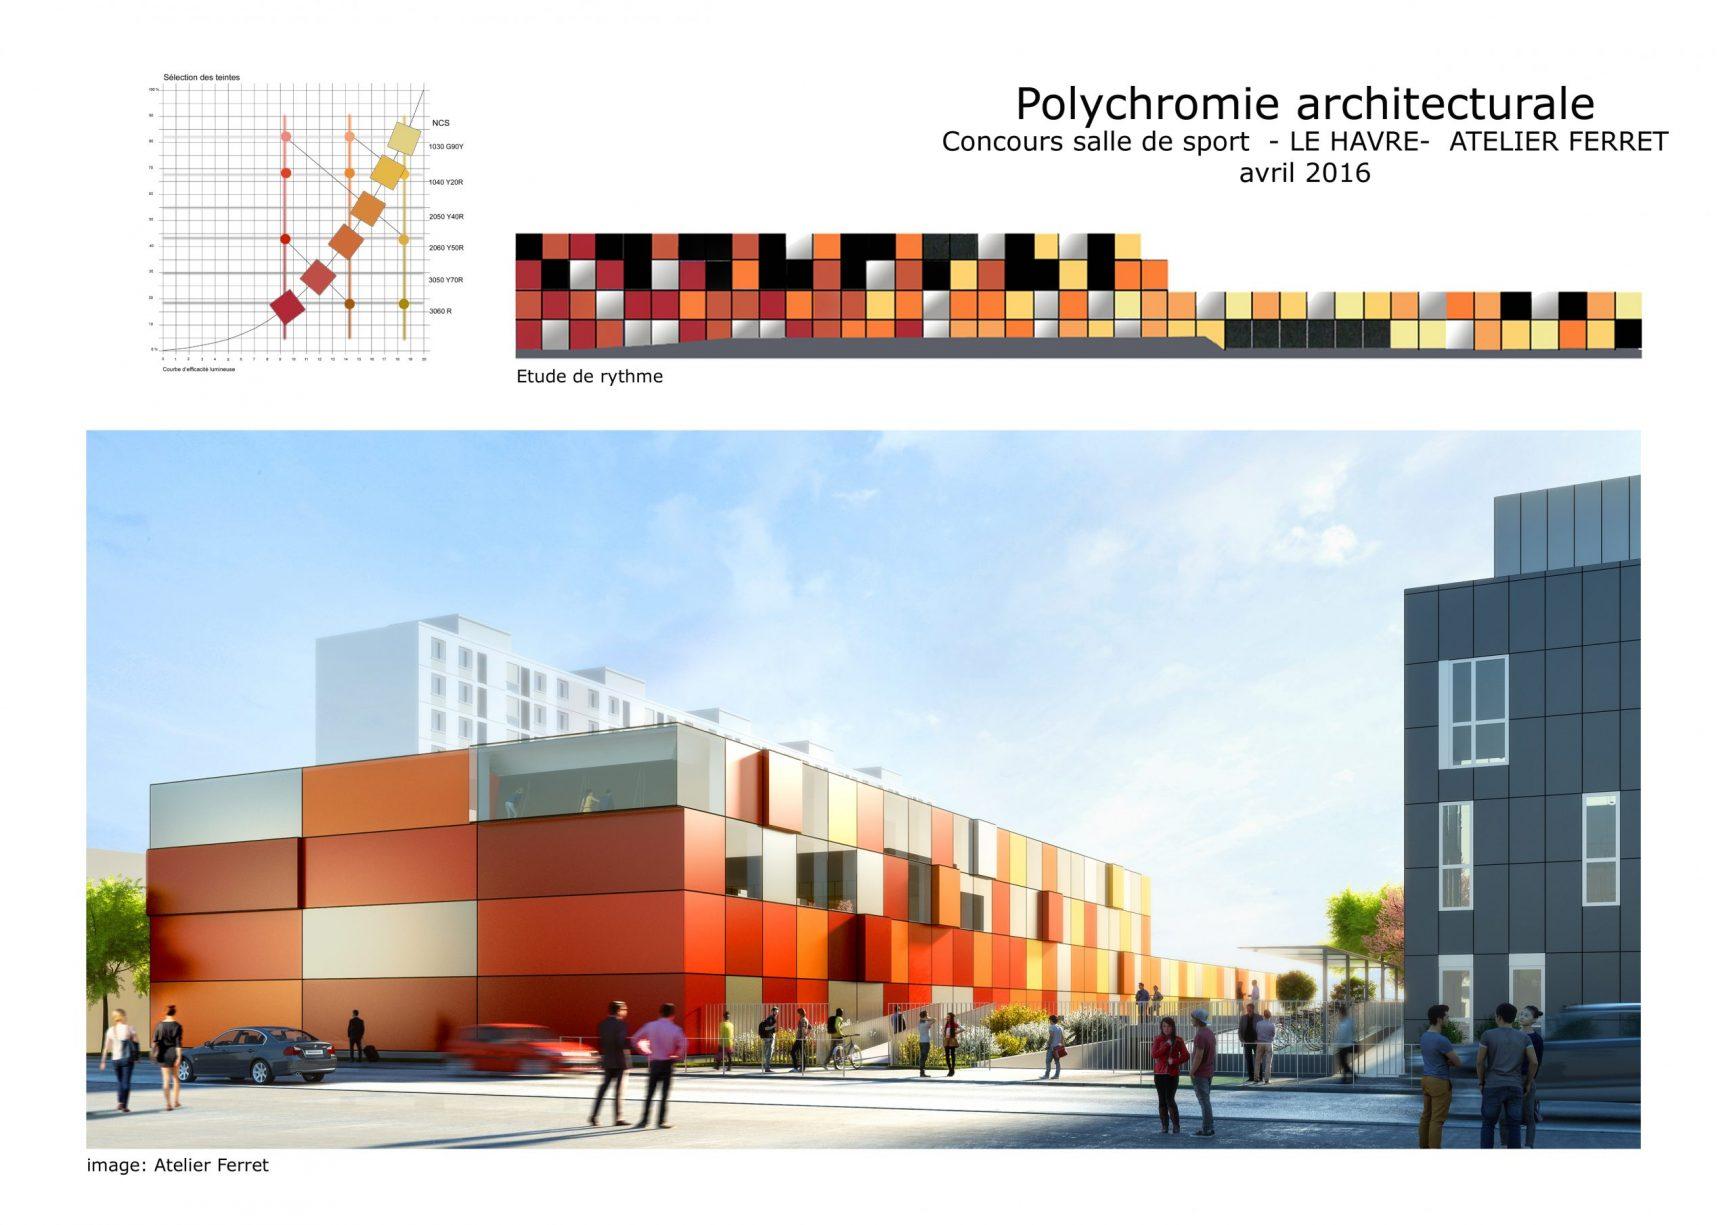 Polychromie architecturale urbaine-Concours